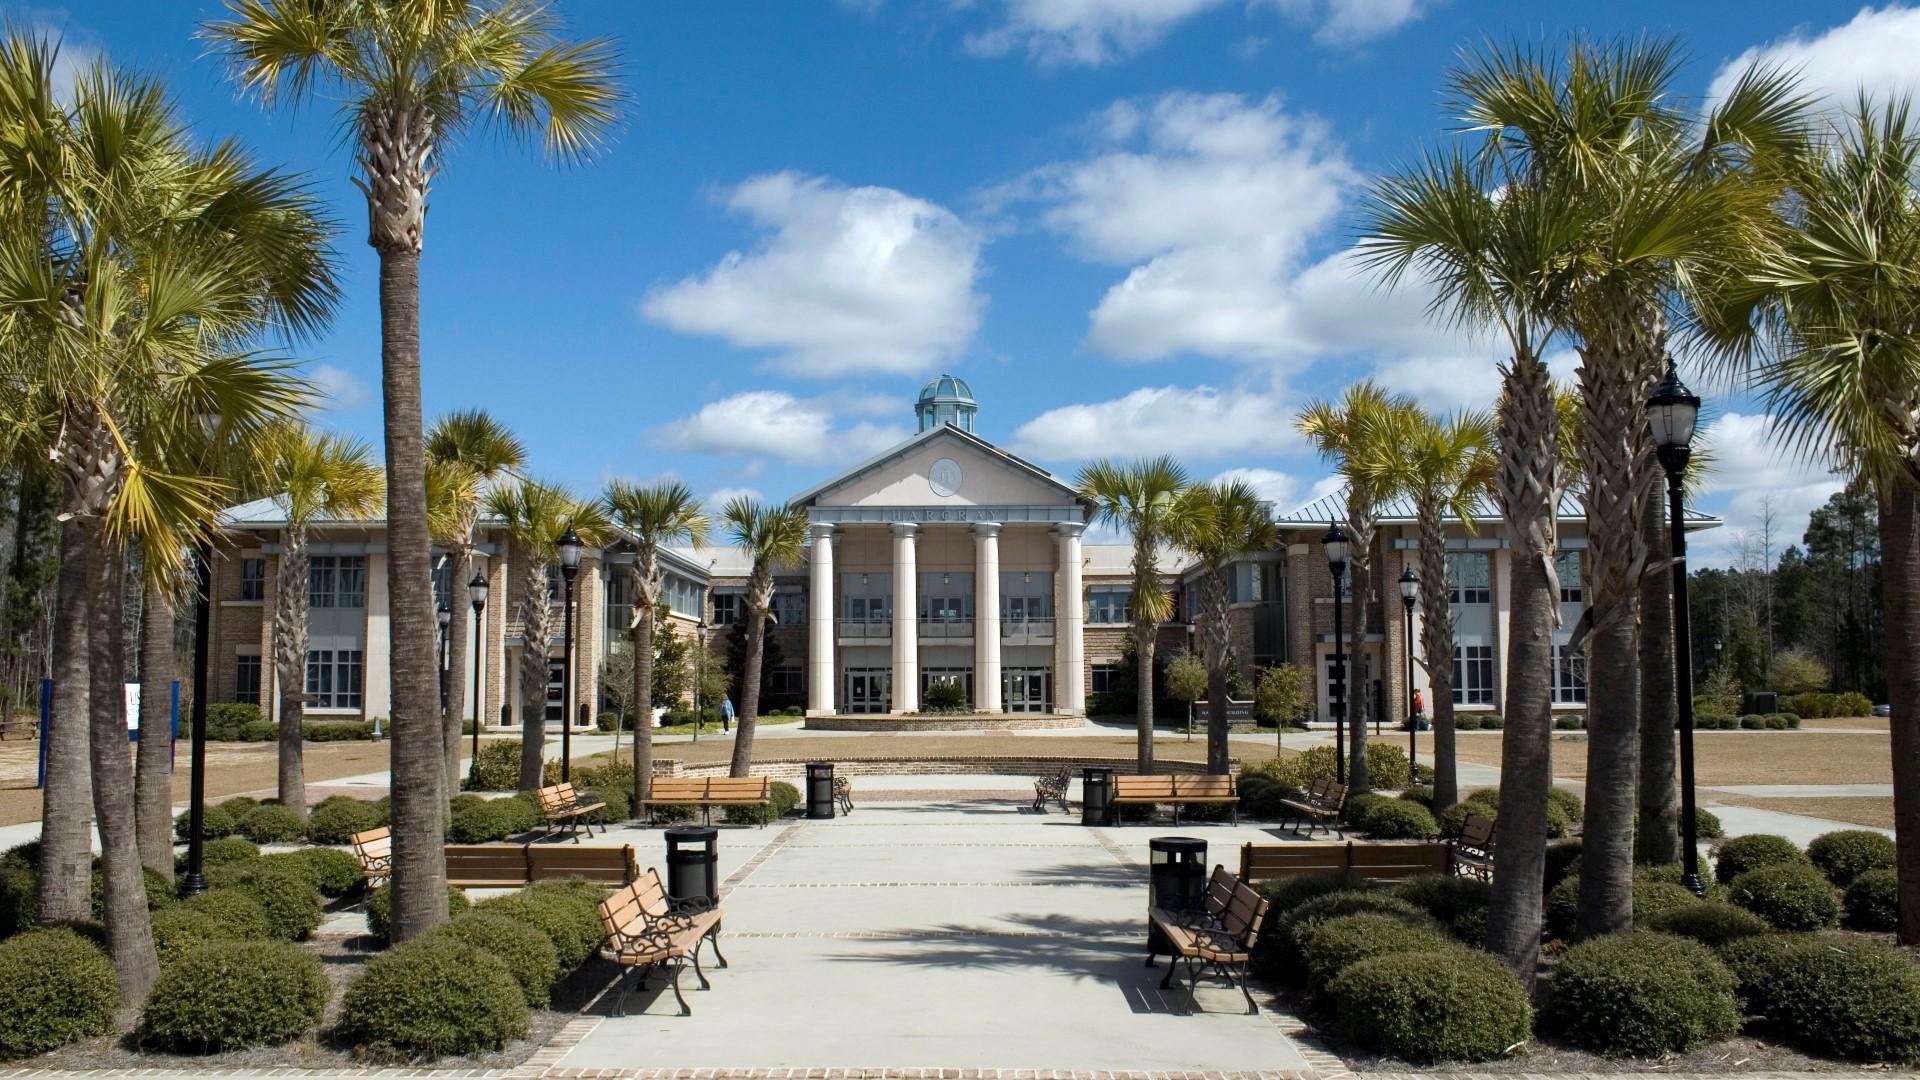 University of South Carolina Beaufort campus